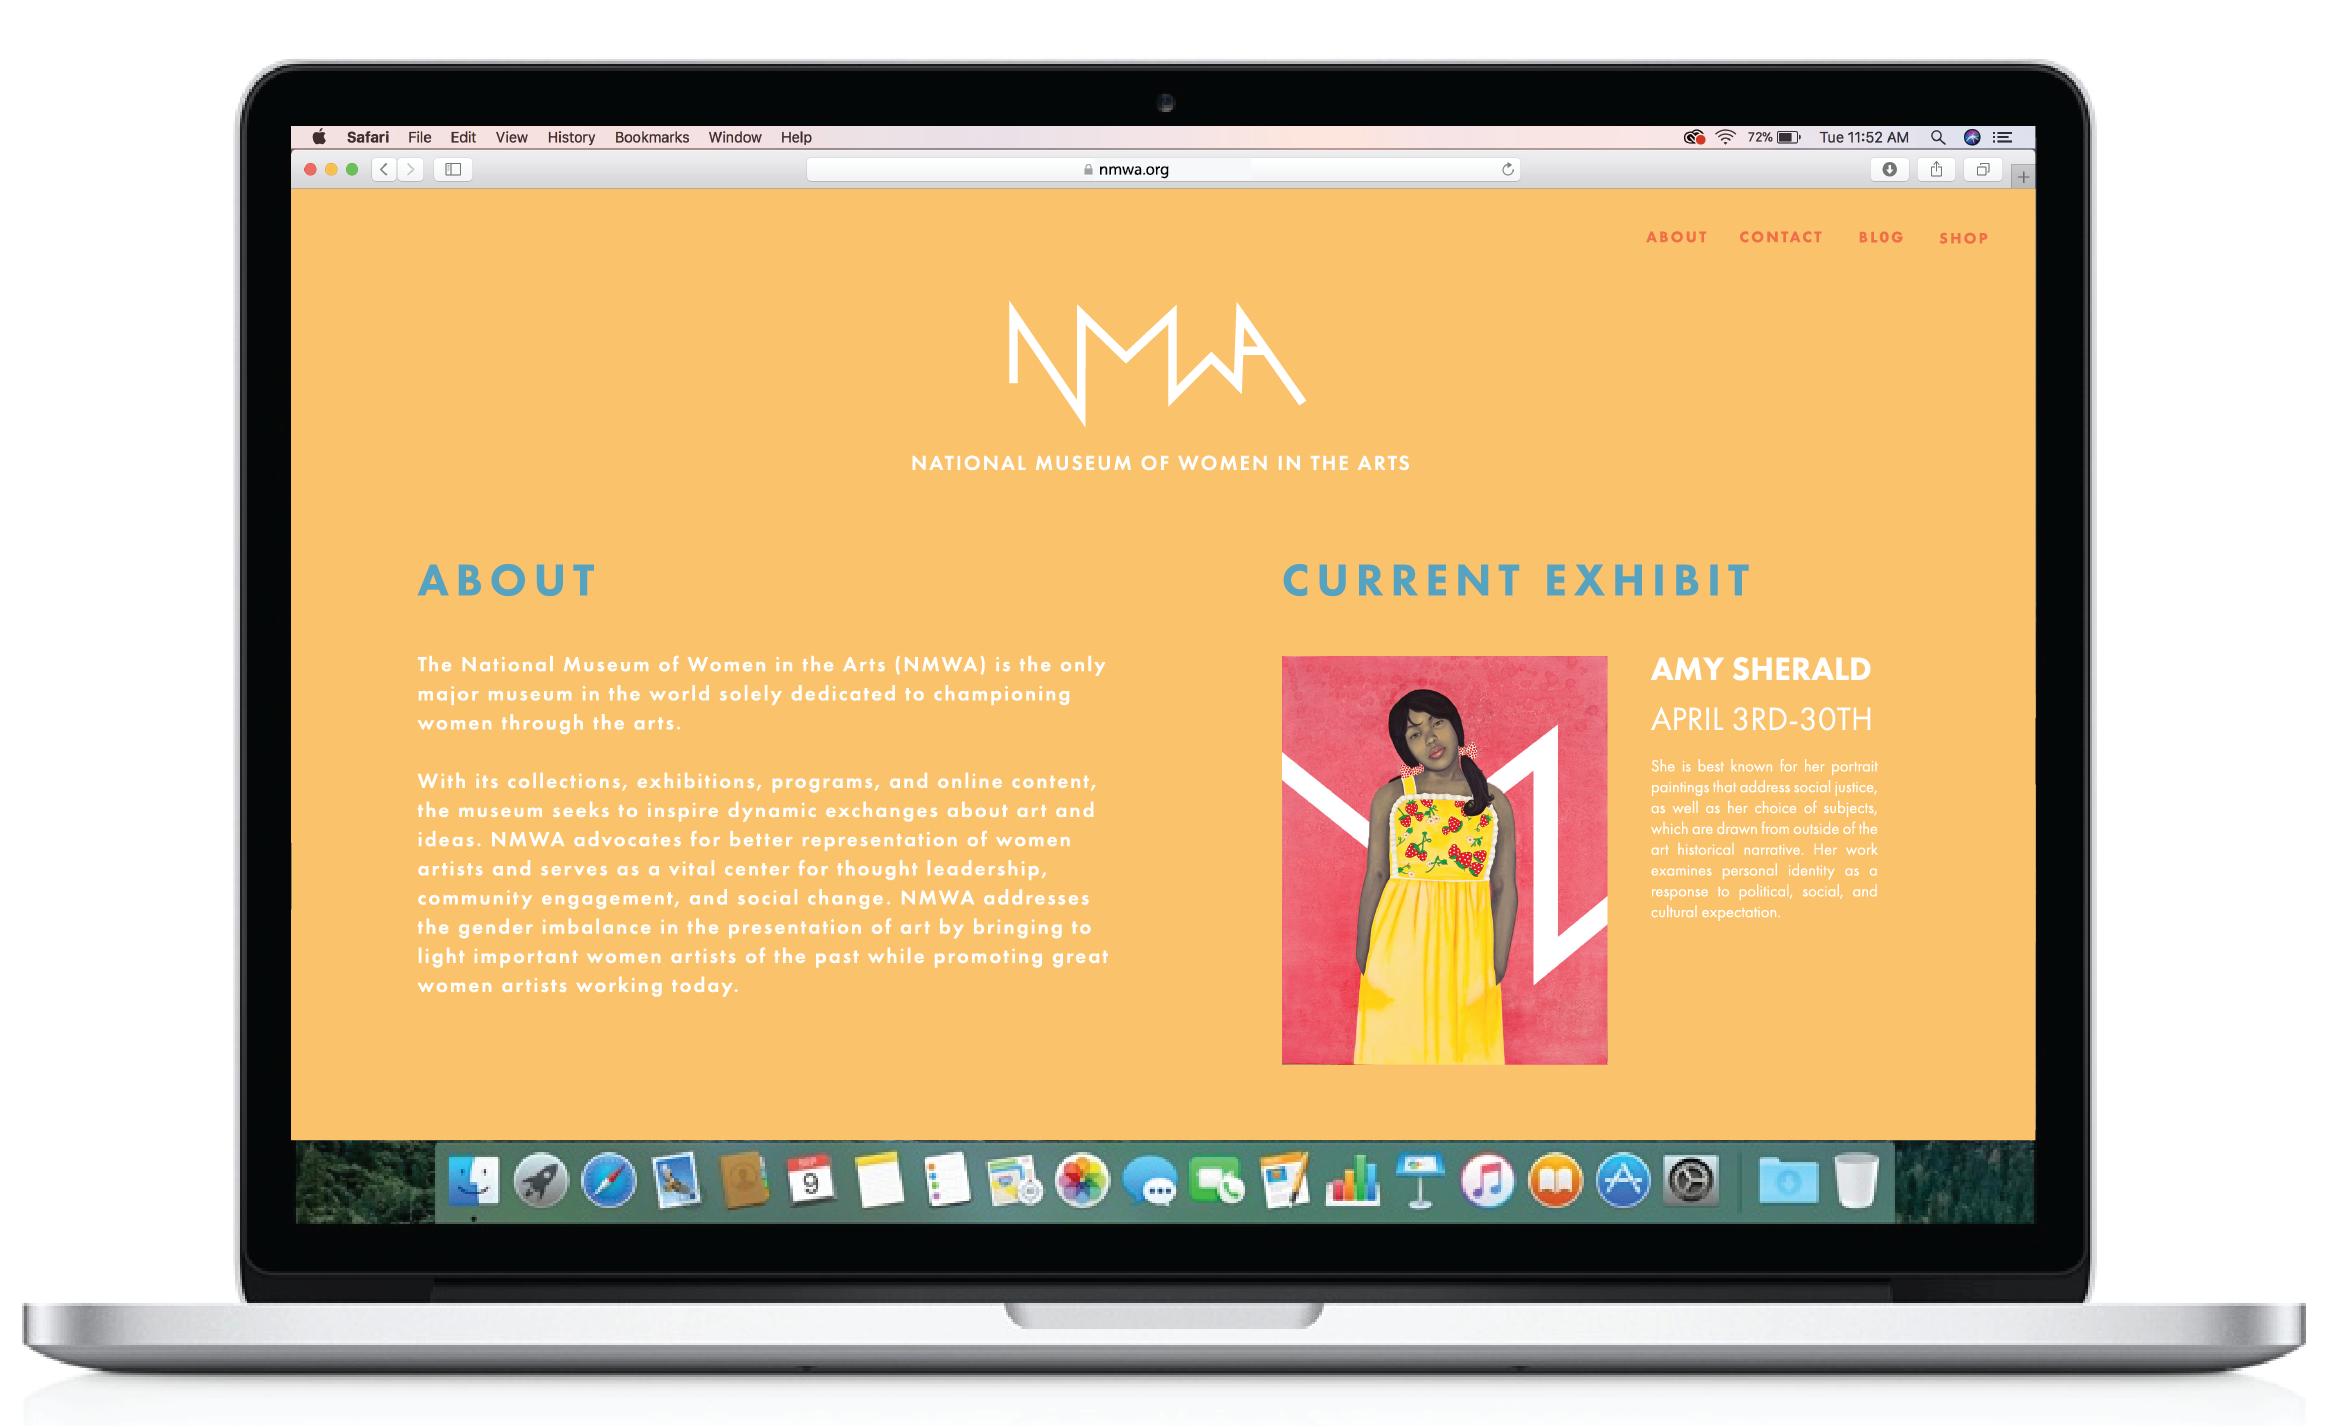 NMWA_applications-19.png